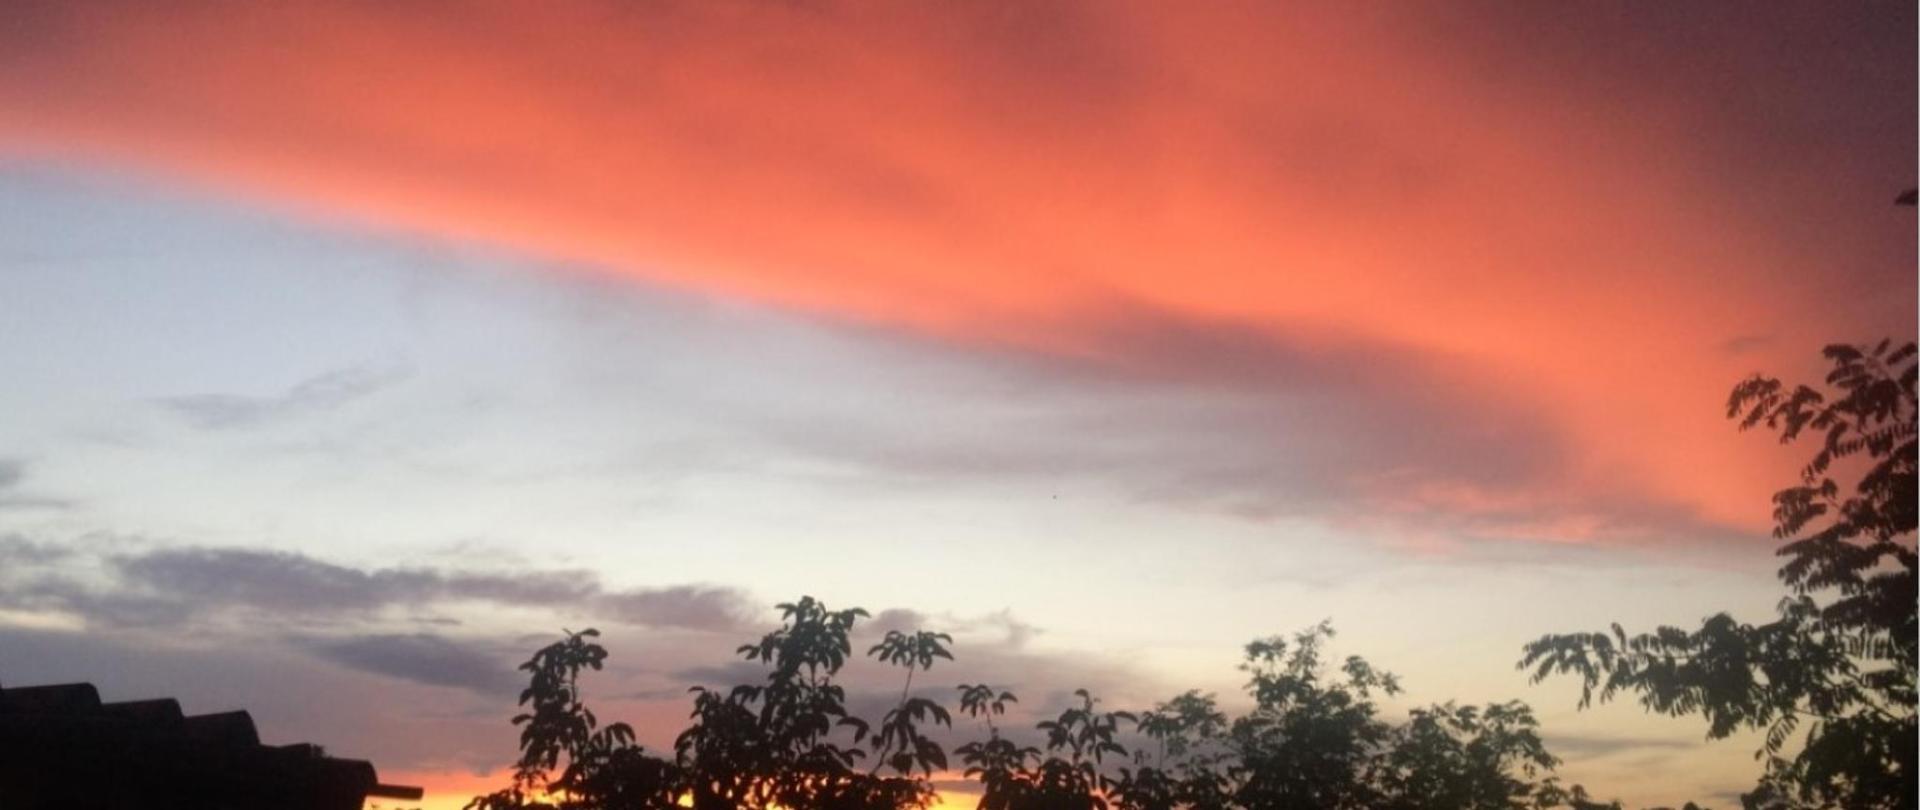 IMG-tramonto7.jpg